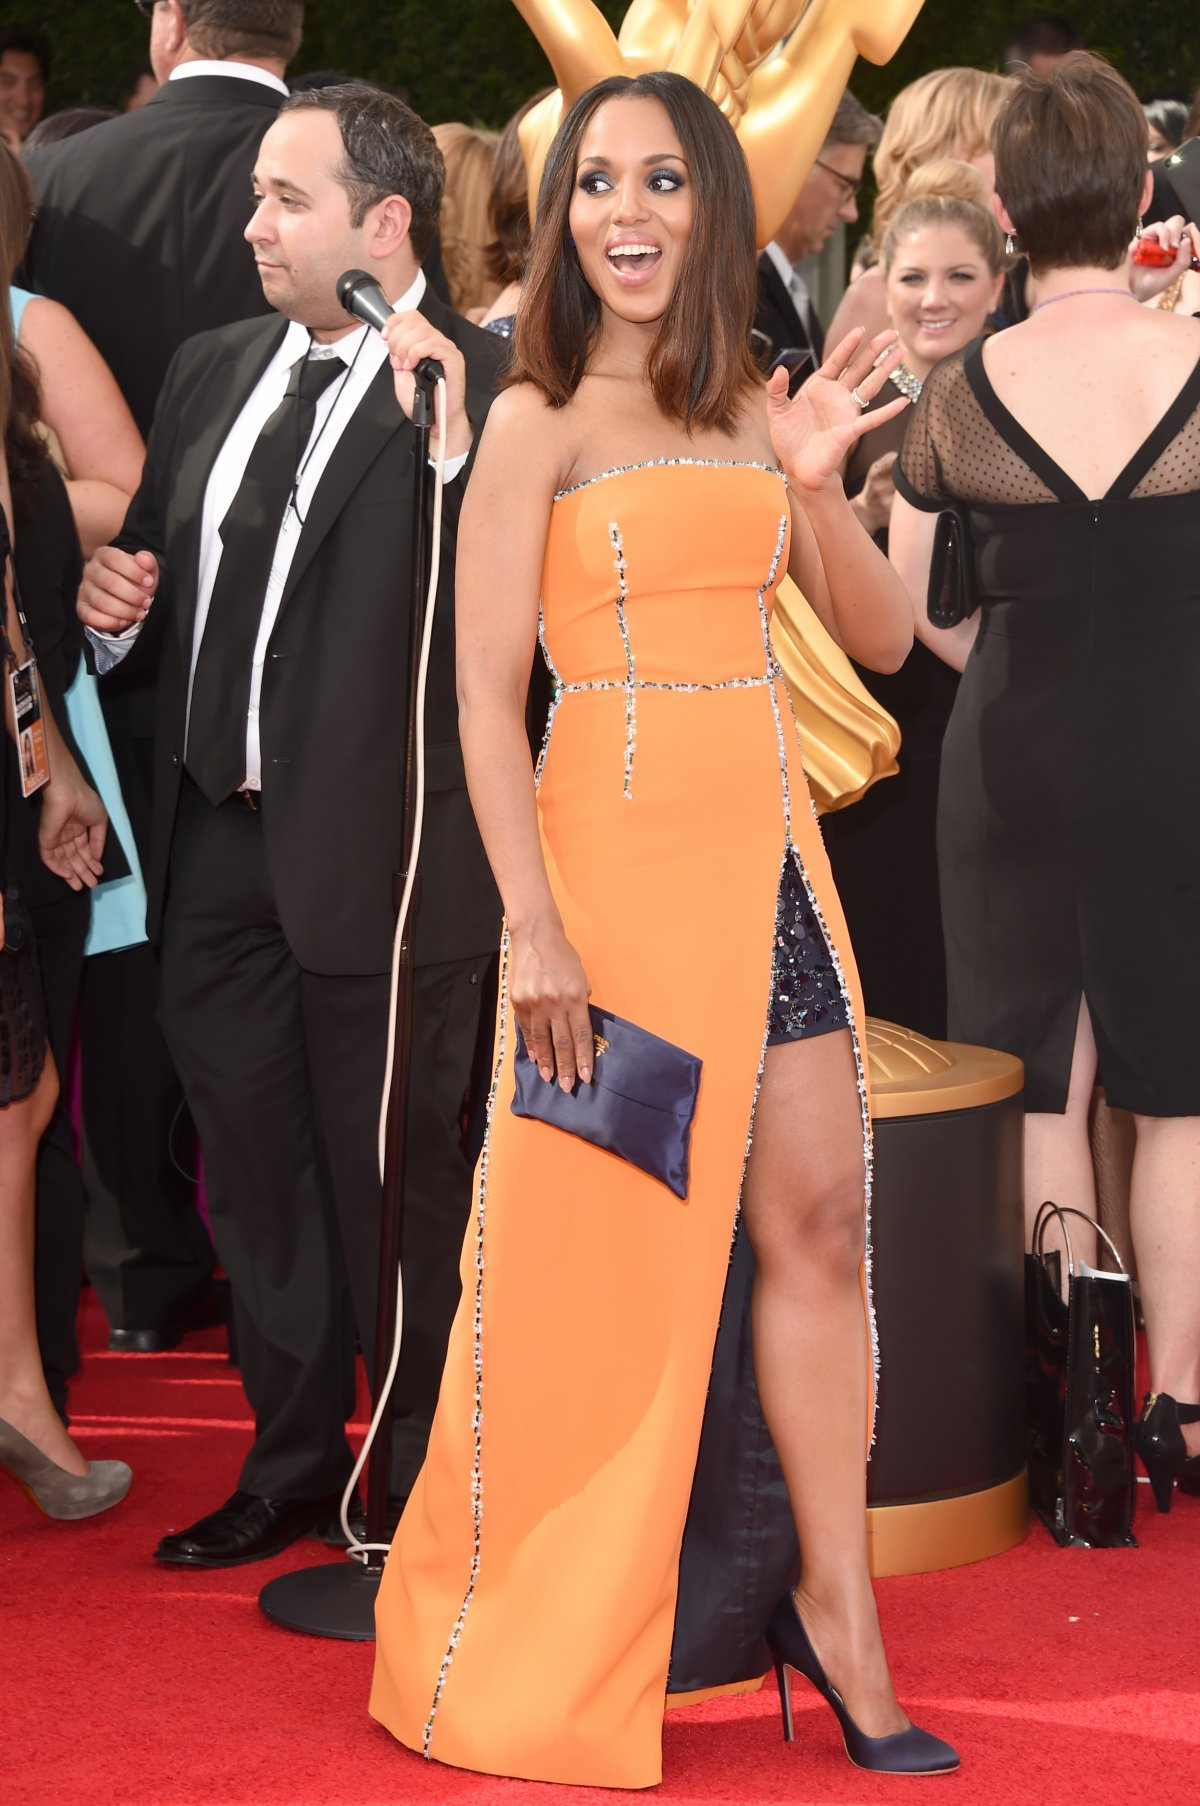 scandal-best-actress-nominee-kerry-washington-looking-radiant-in-prada